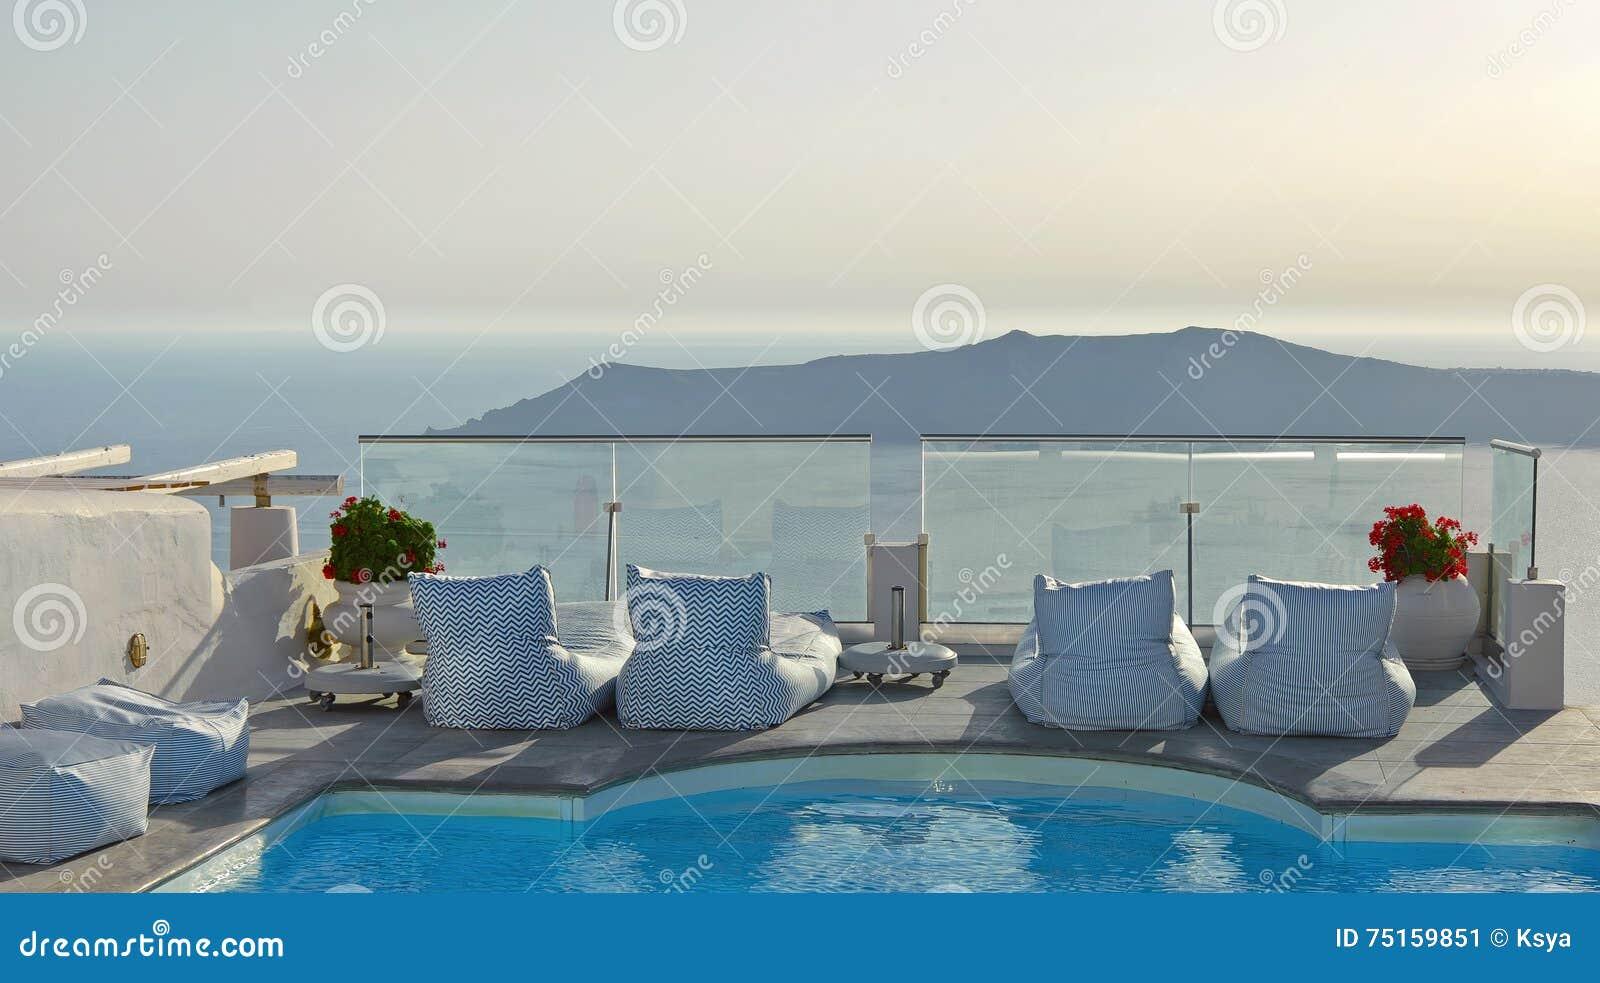 balkon mit pool in imerovigli santorini griechenland mit. Black Bedroom Furniture Sets. Home Design Ideas